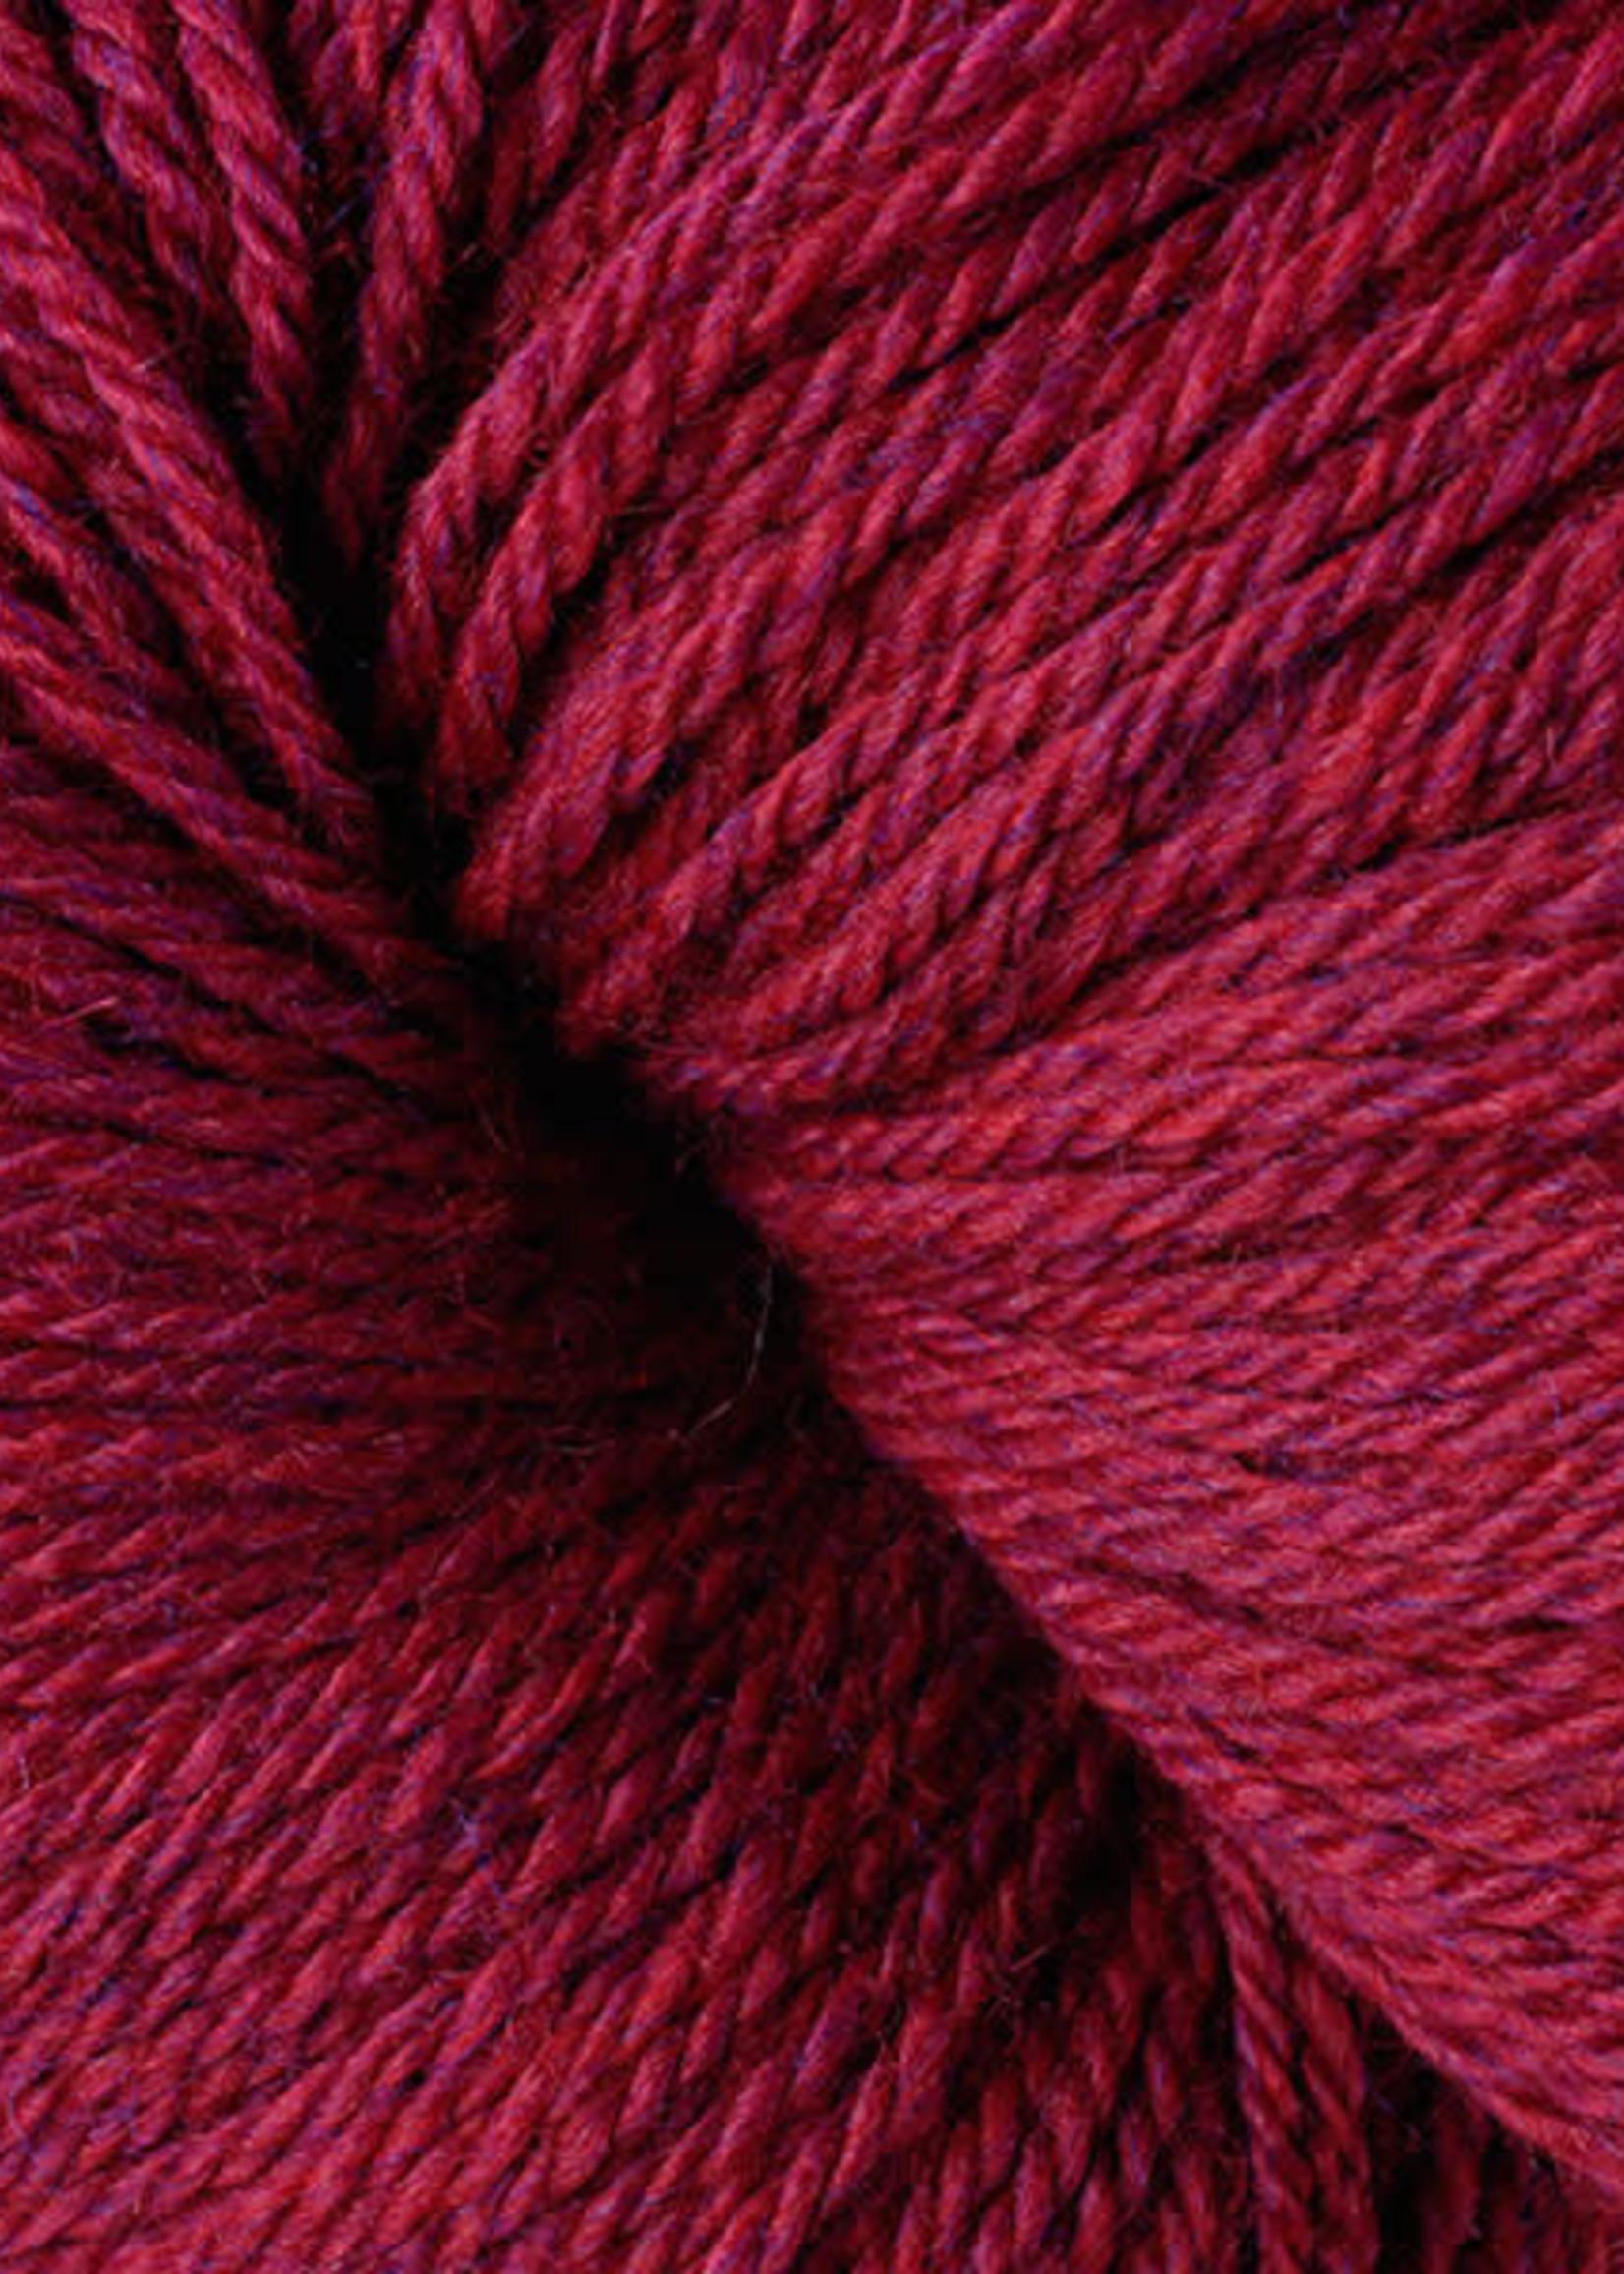 Berroco Berroco Vintage DK Yarn #21181 Ruby